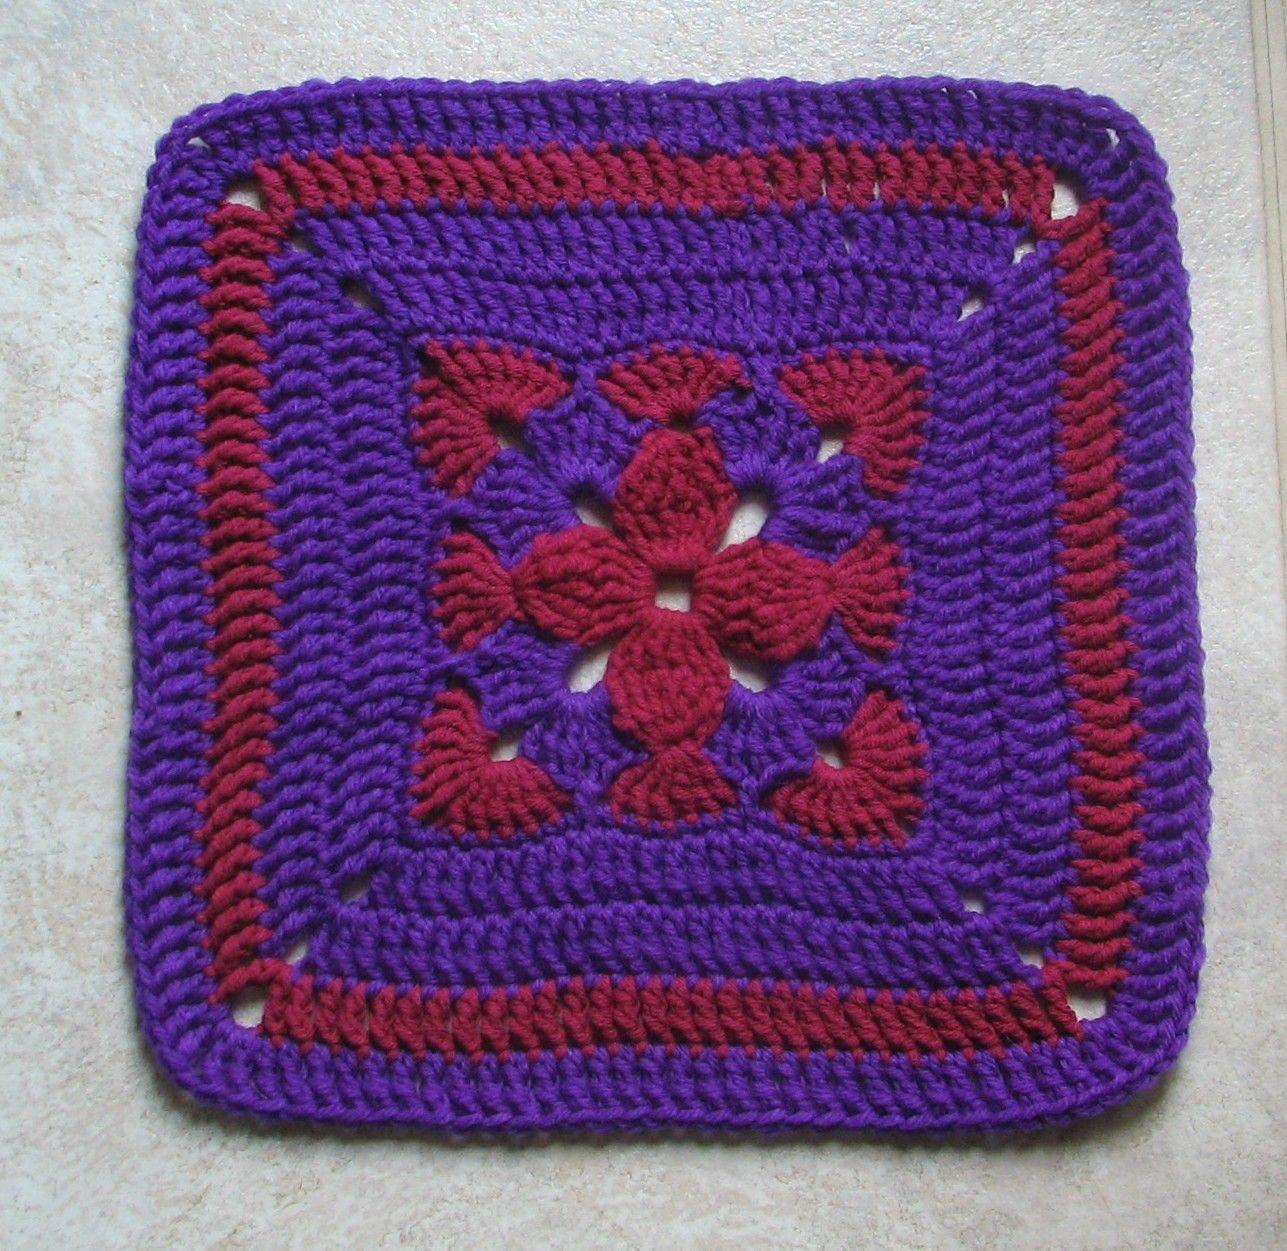 Afghan Square - free crochet pattern | Cuadritos en crochet ...